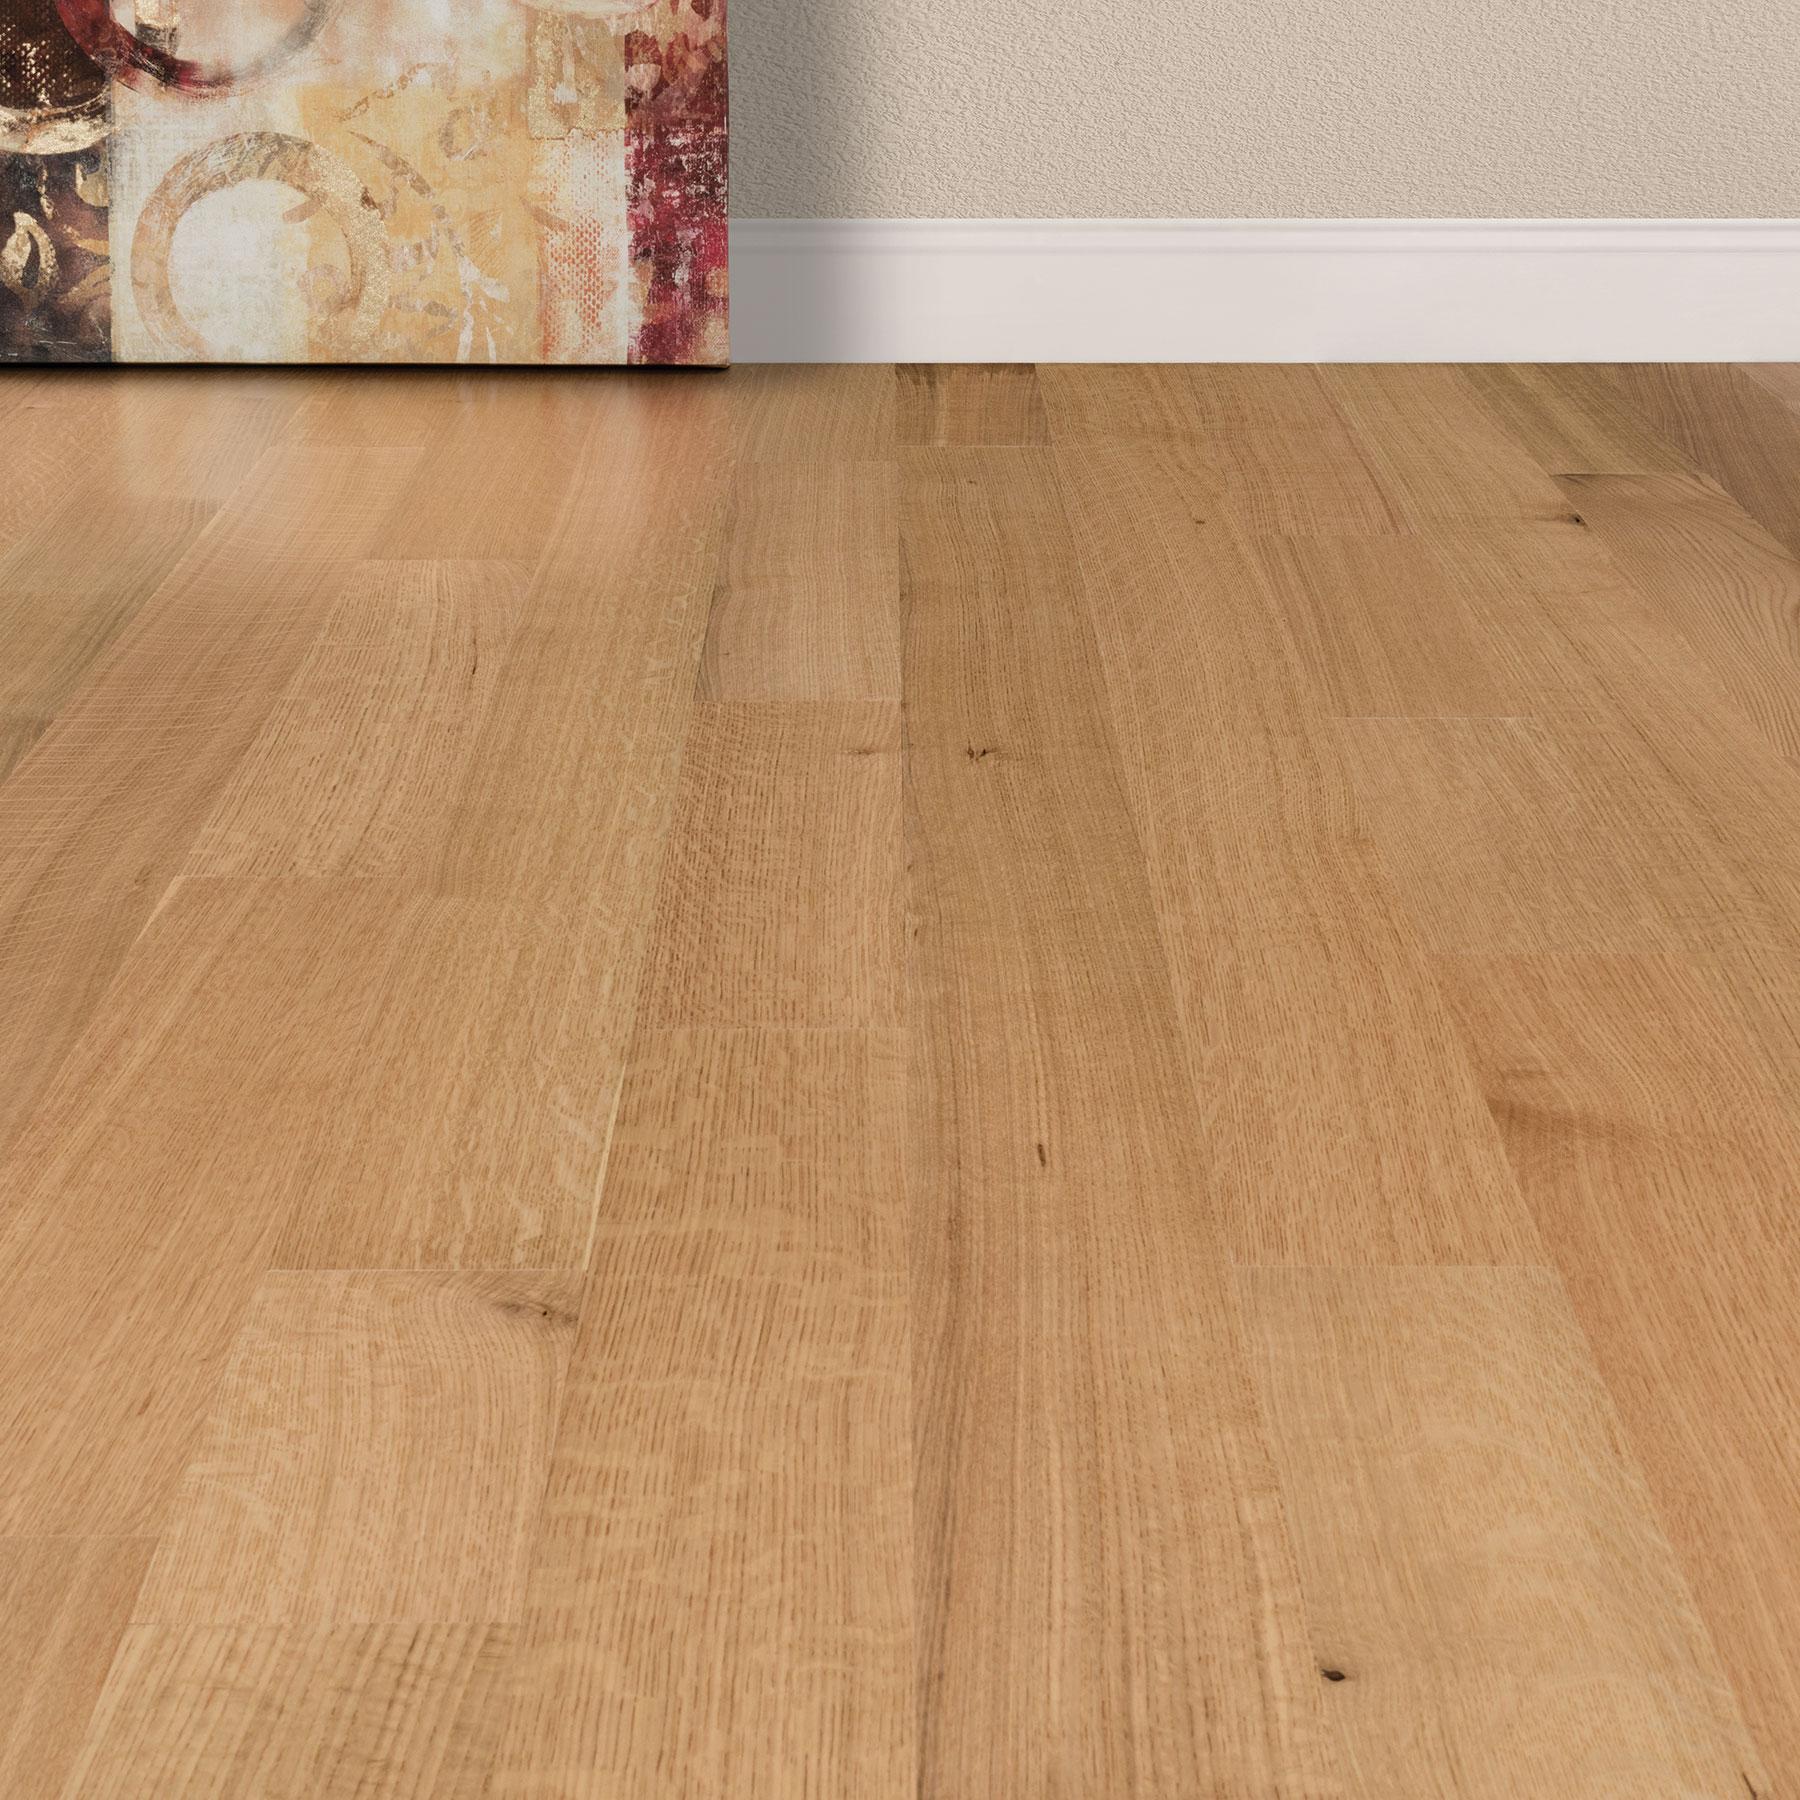 designer oil beachwood european white flooring floors lauzon oak hardwood glamorous kitchen gothic light extraordinary finish natural wood hamptons